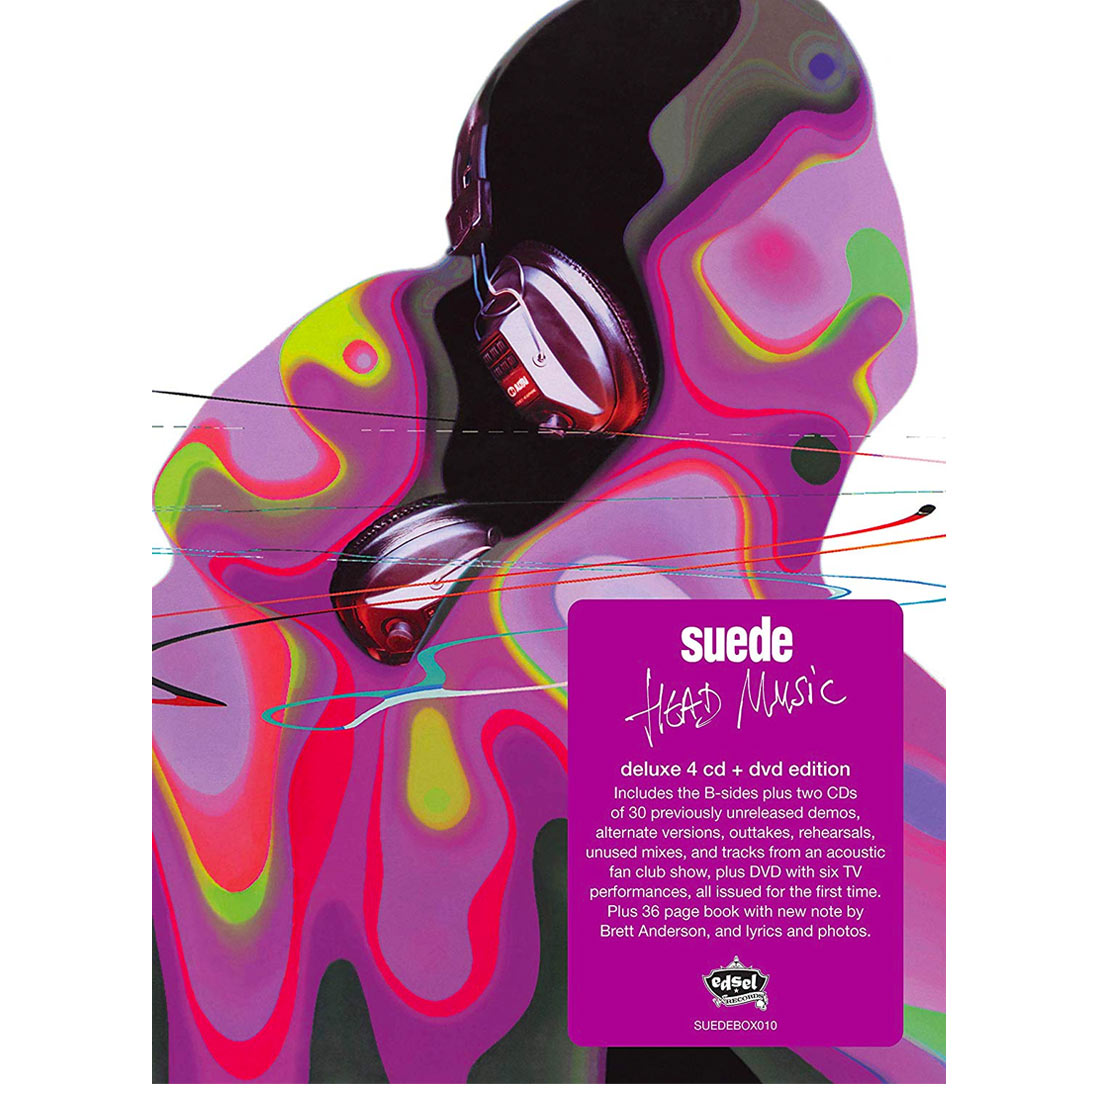 Suede / Head Music 20th anniversary 4CD+DVD